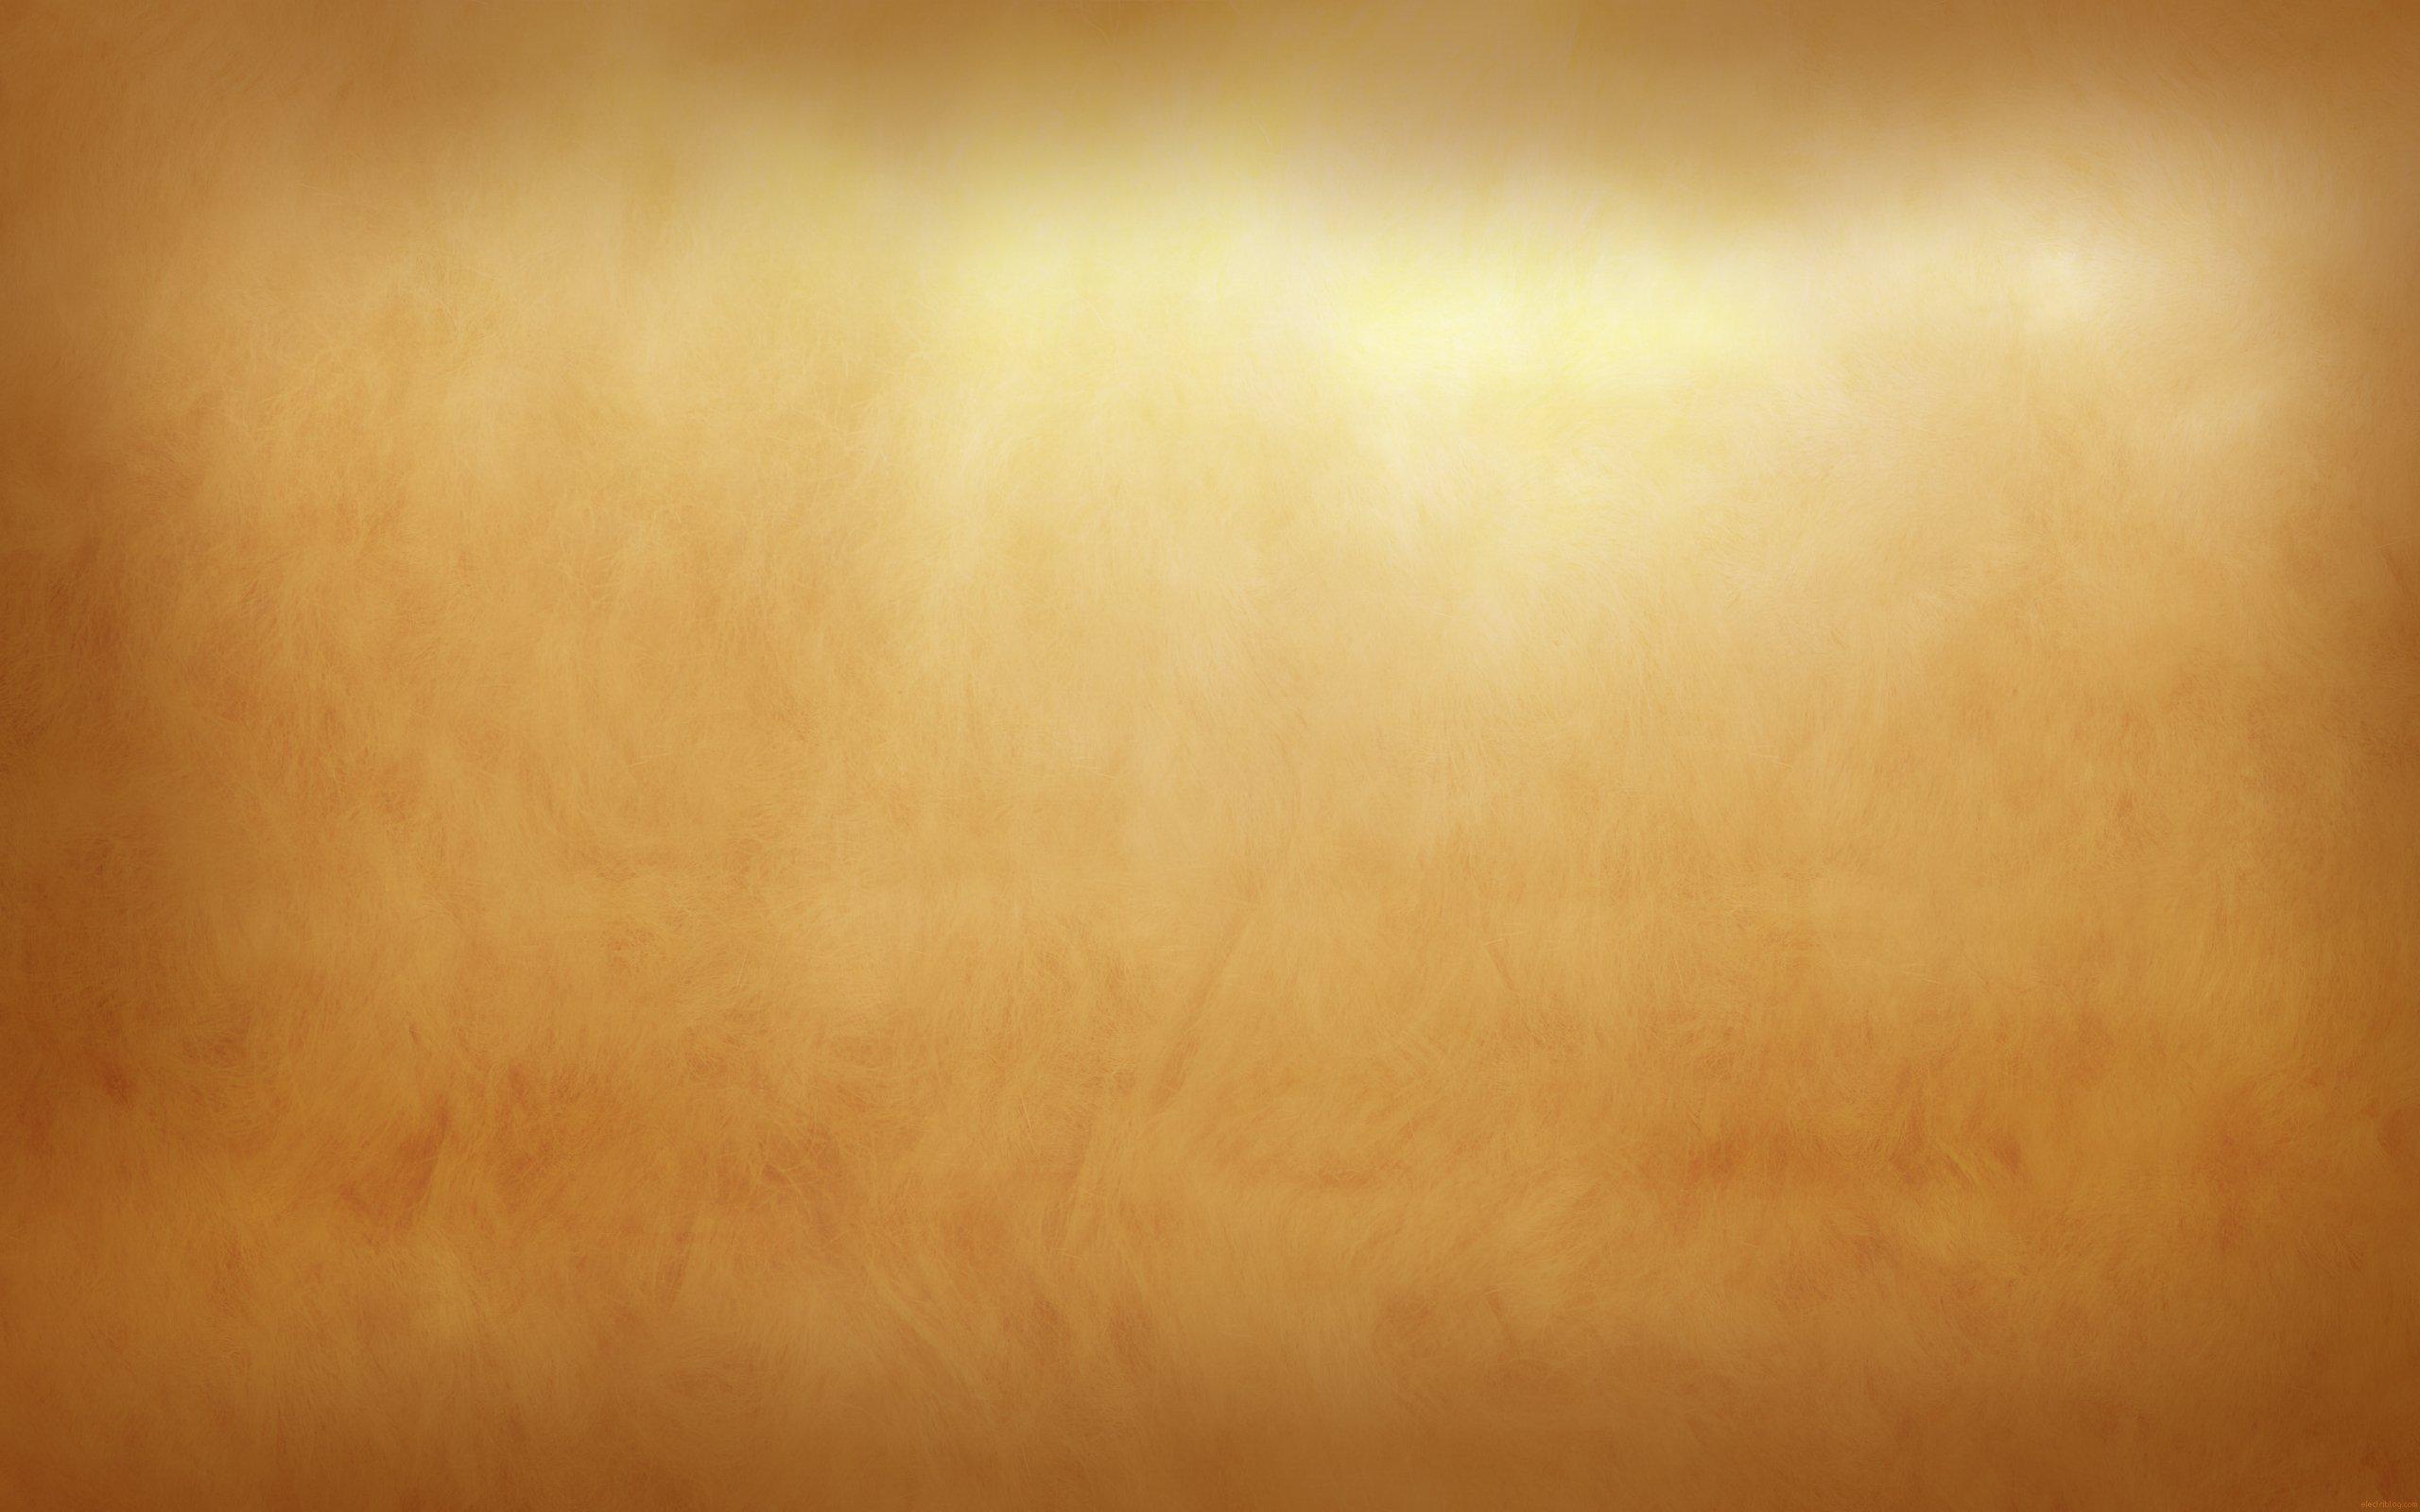 2560x1600 brown paper texture - photo #21